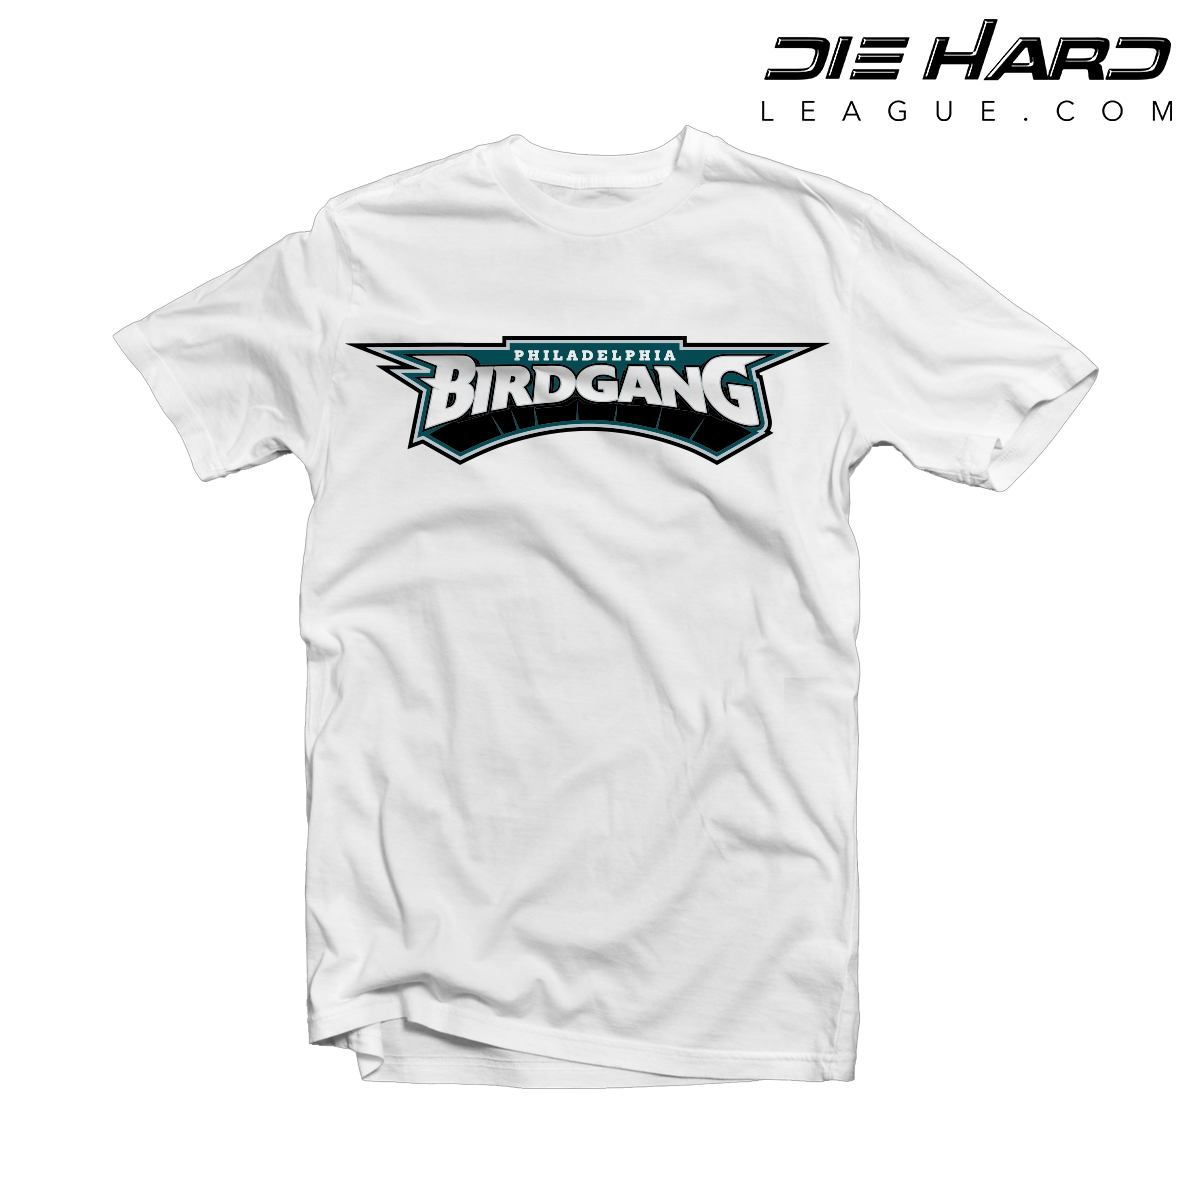 brand new 8b32c 23ee5 Eagles T Shirts - Philadelphia Eagles Bird Gang White Tee